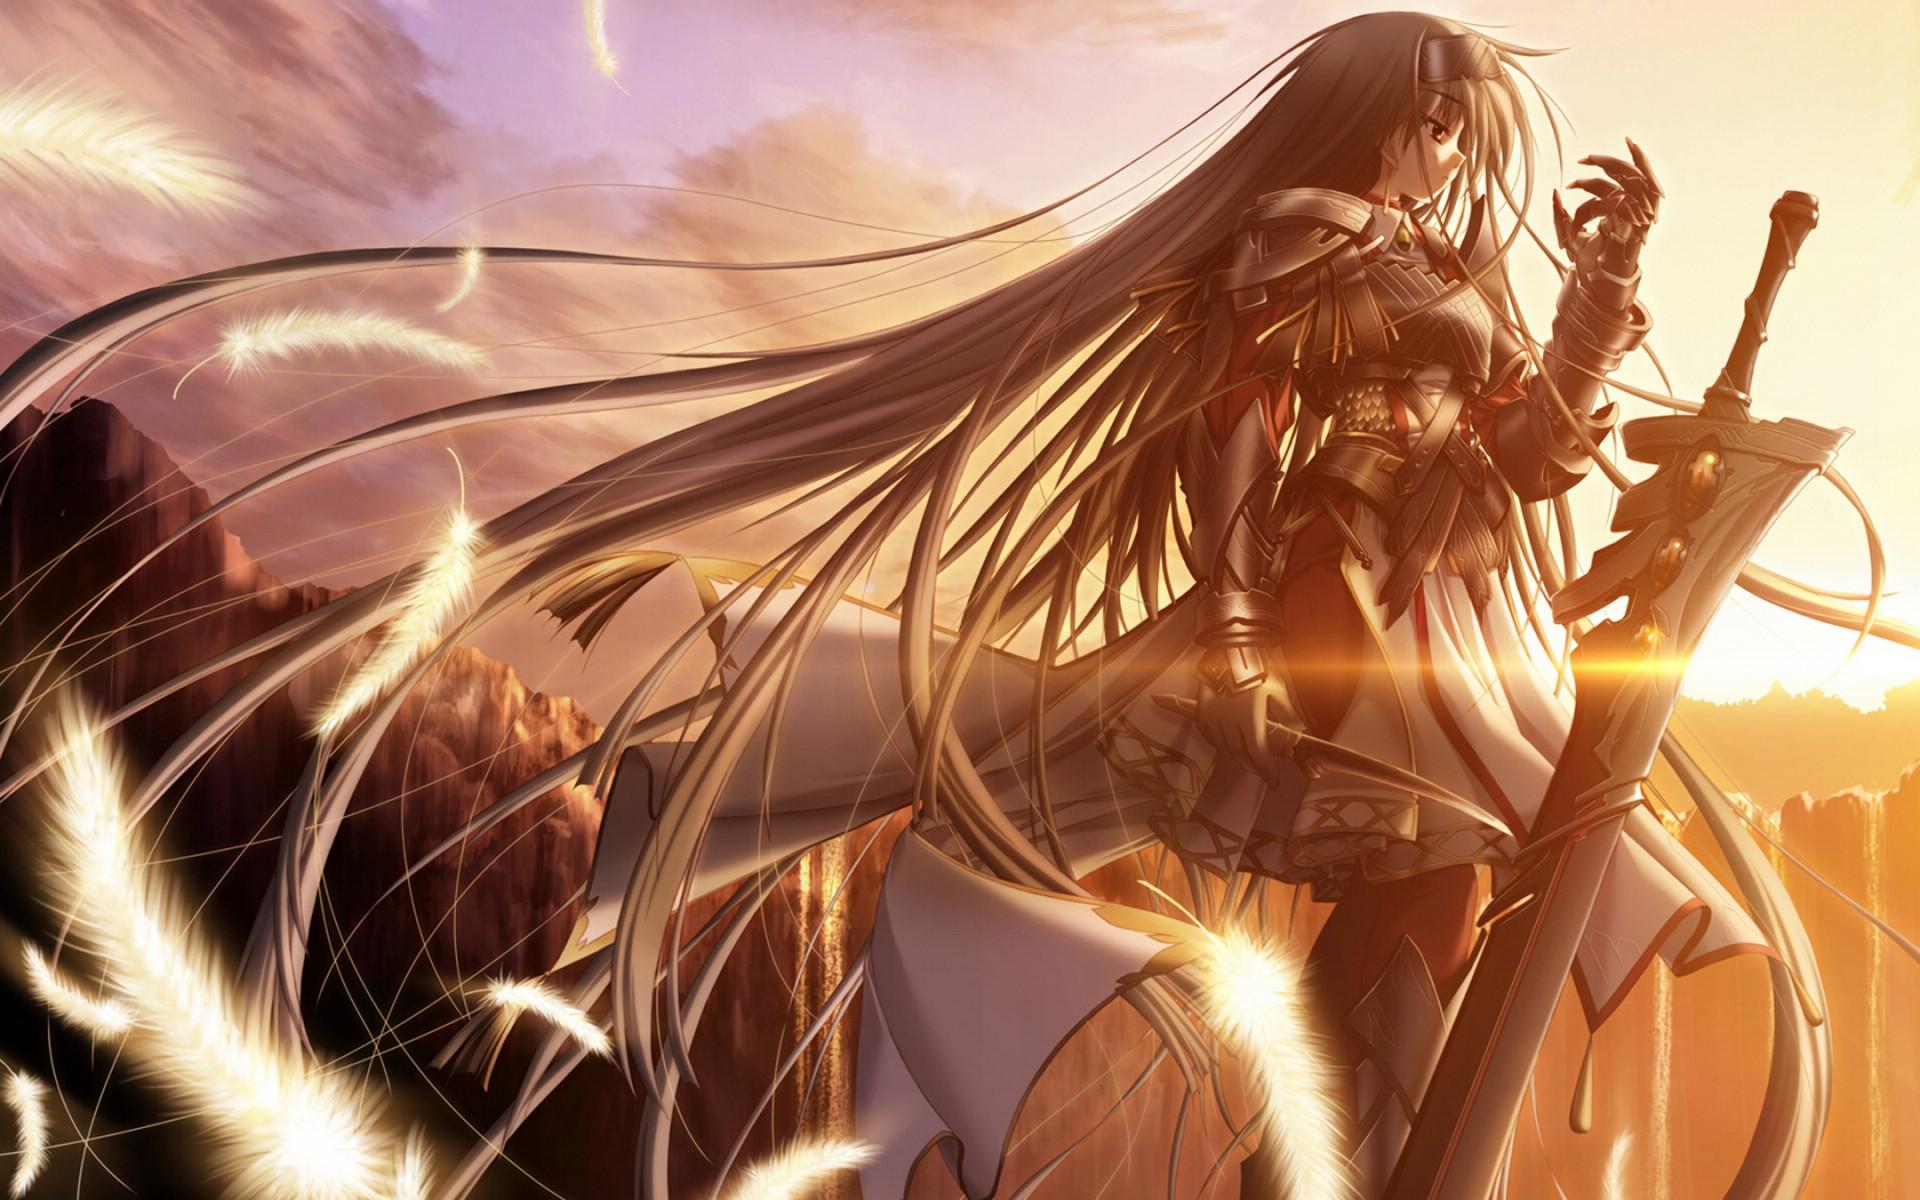 Video Game - Blood Of Darkness Geass Armor Long Hair Sunset Cliff Girl Warrior Sword Feather 1920x1200